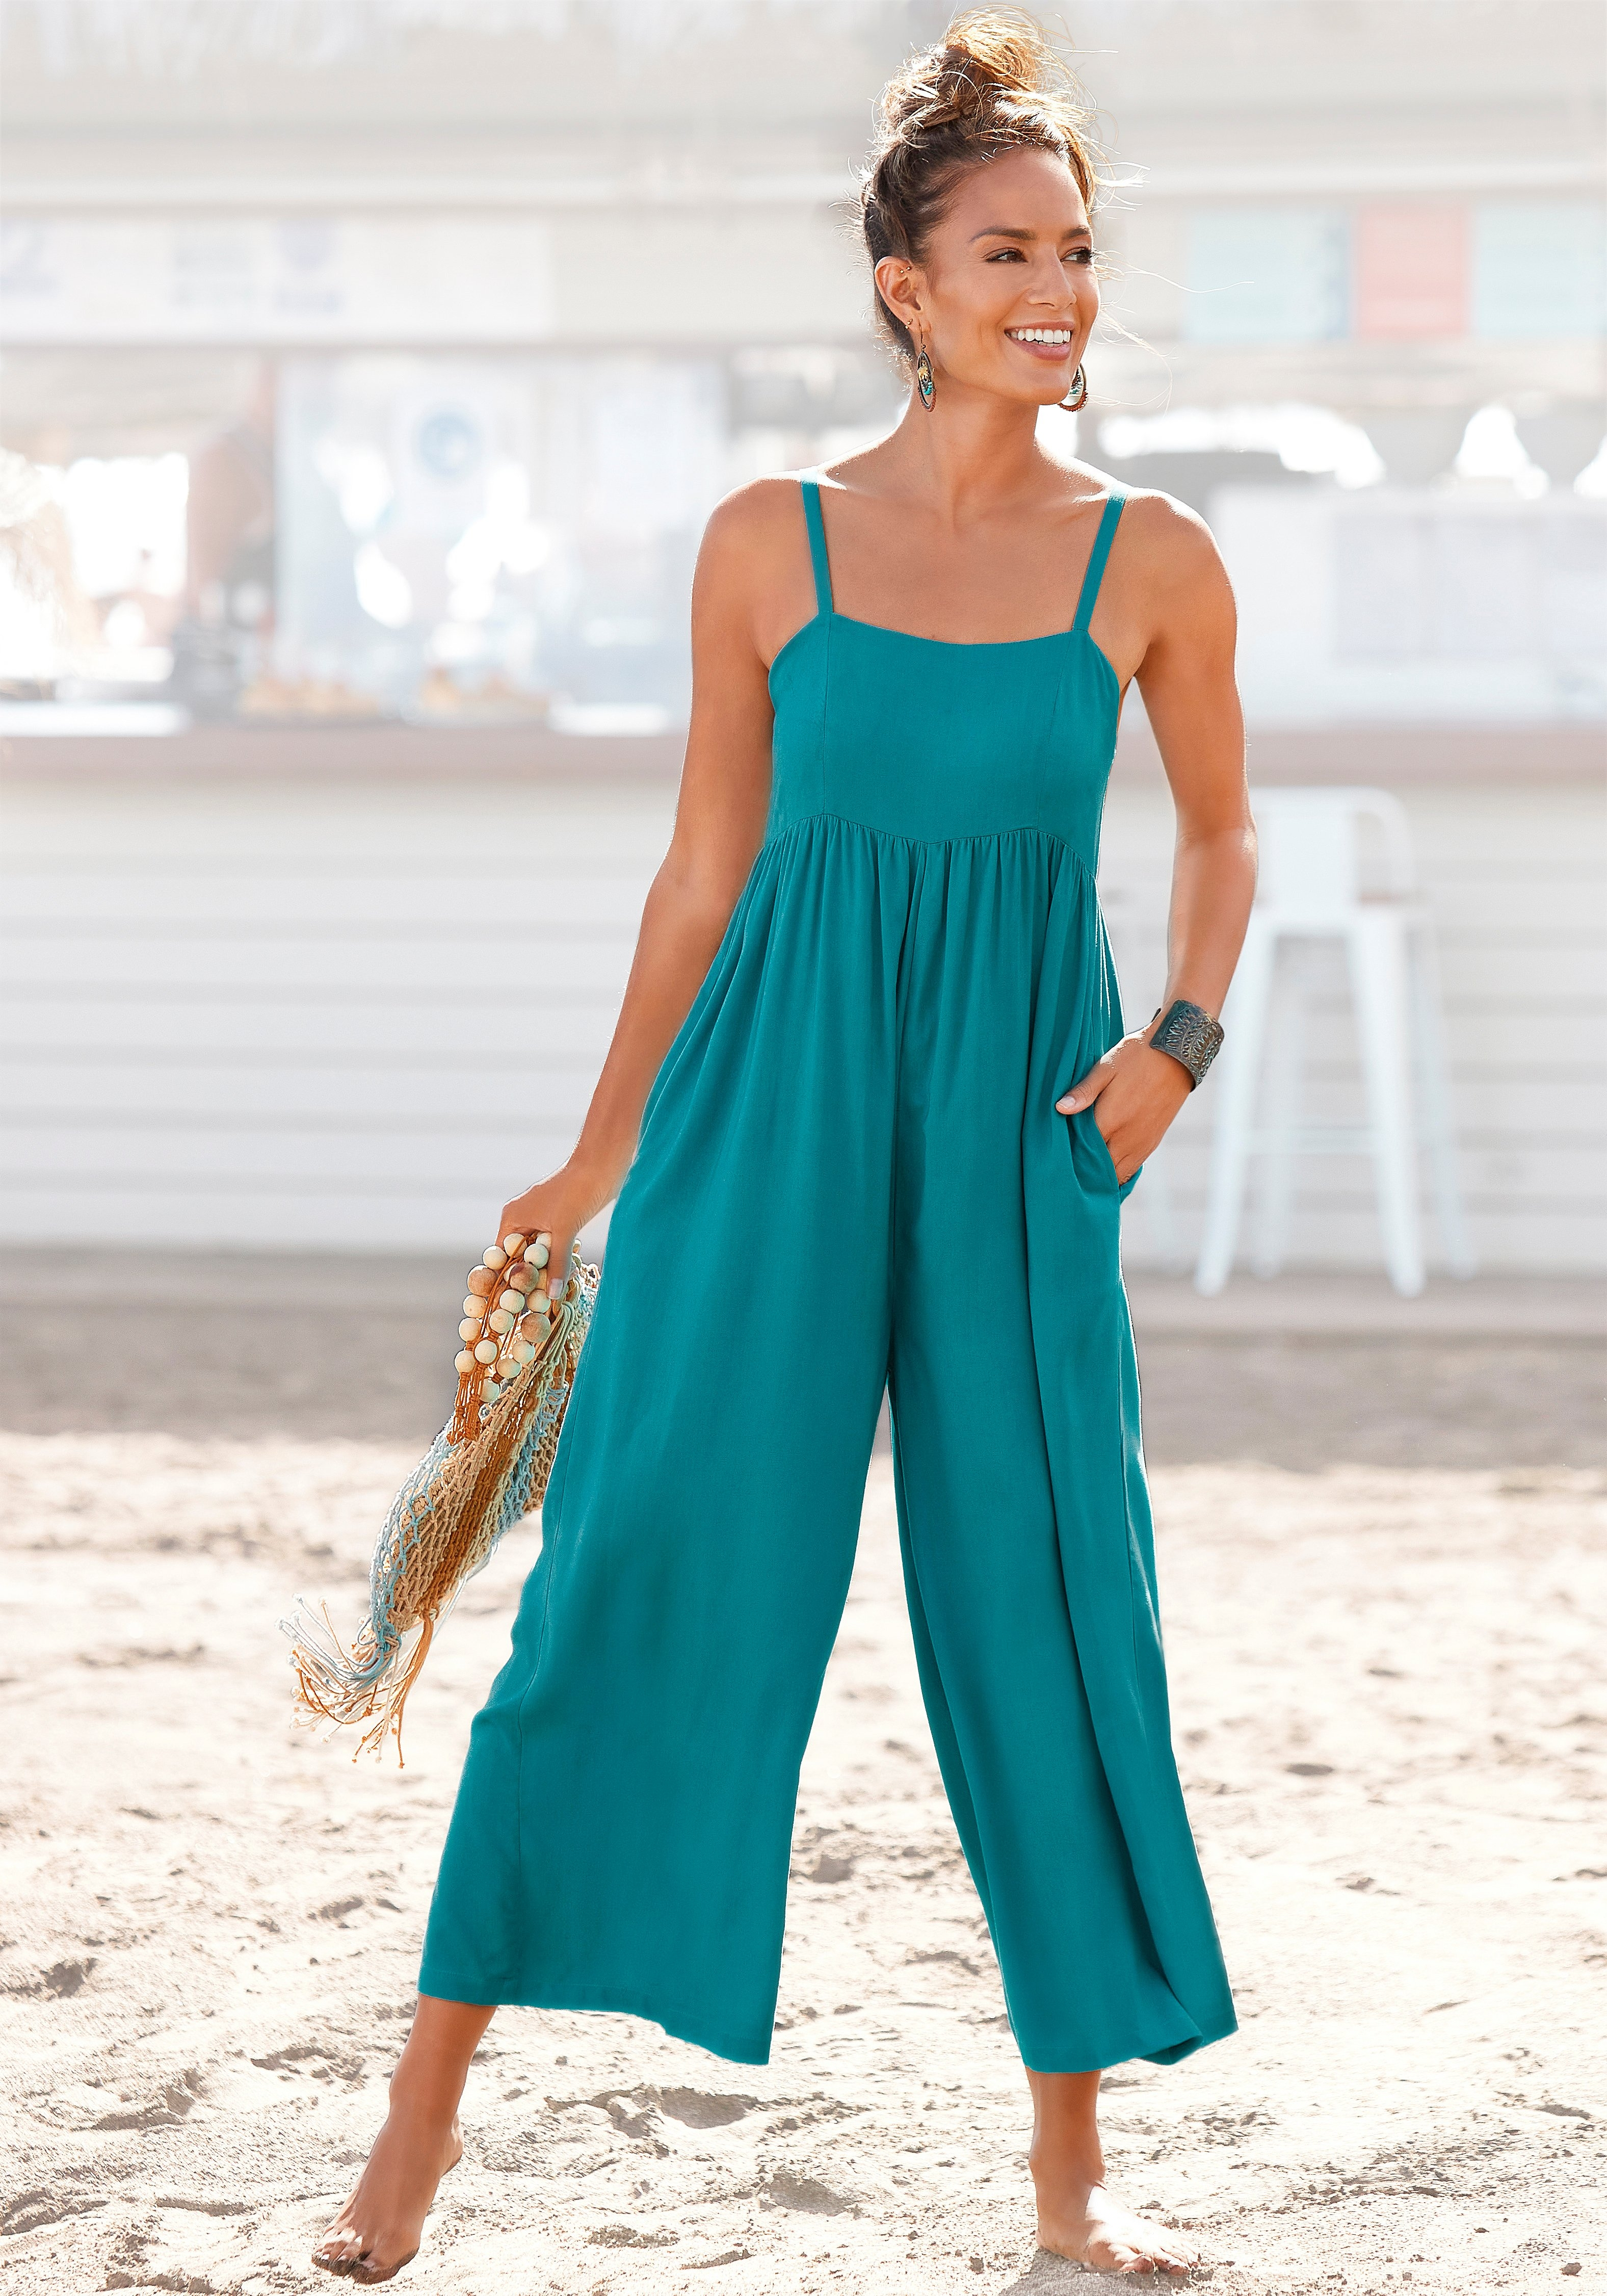 s.Oliver RED LABEL Beachwear jumpsuit in culotte-stijl met spaghettibandjes goedkoop op lascana.nl kopen